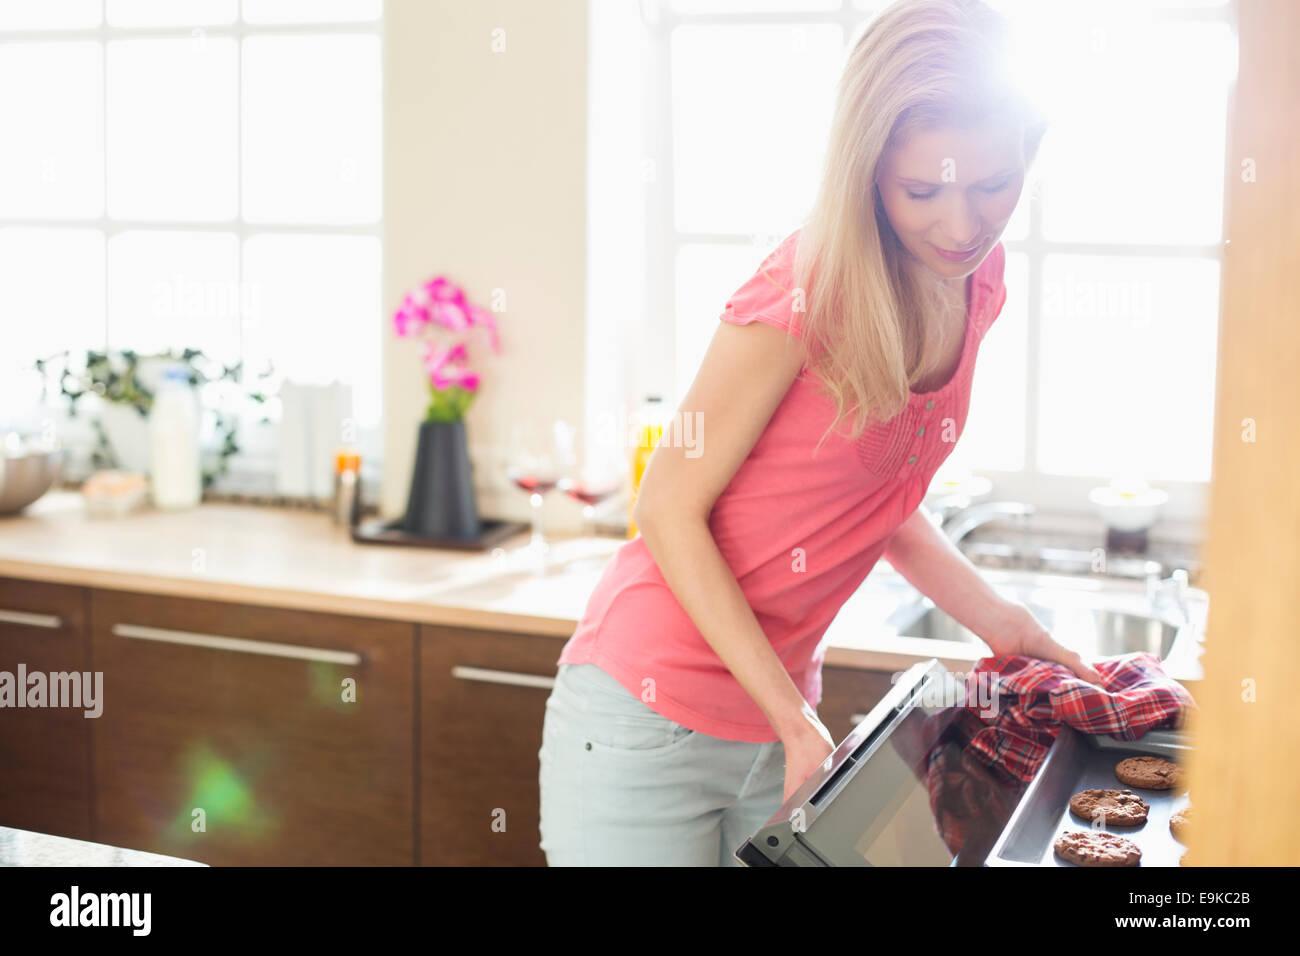 Mid adult woman baking cookies dans la cuisine Photo Stock